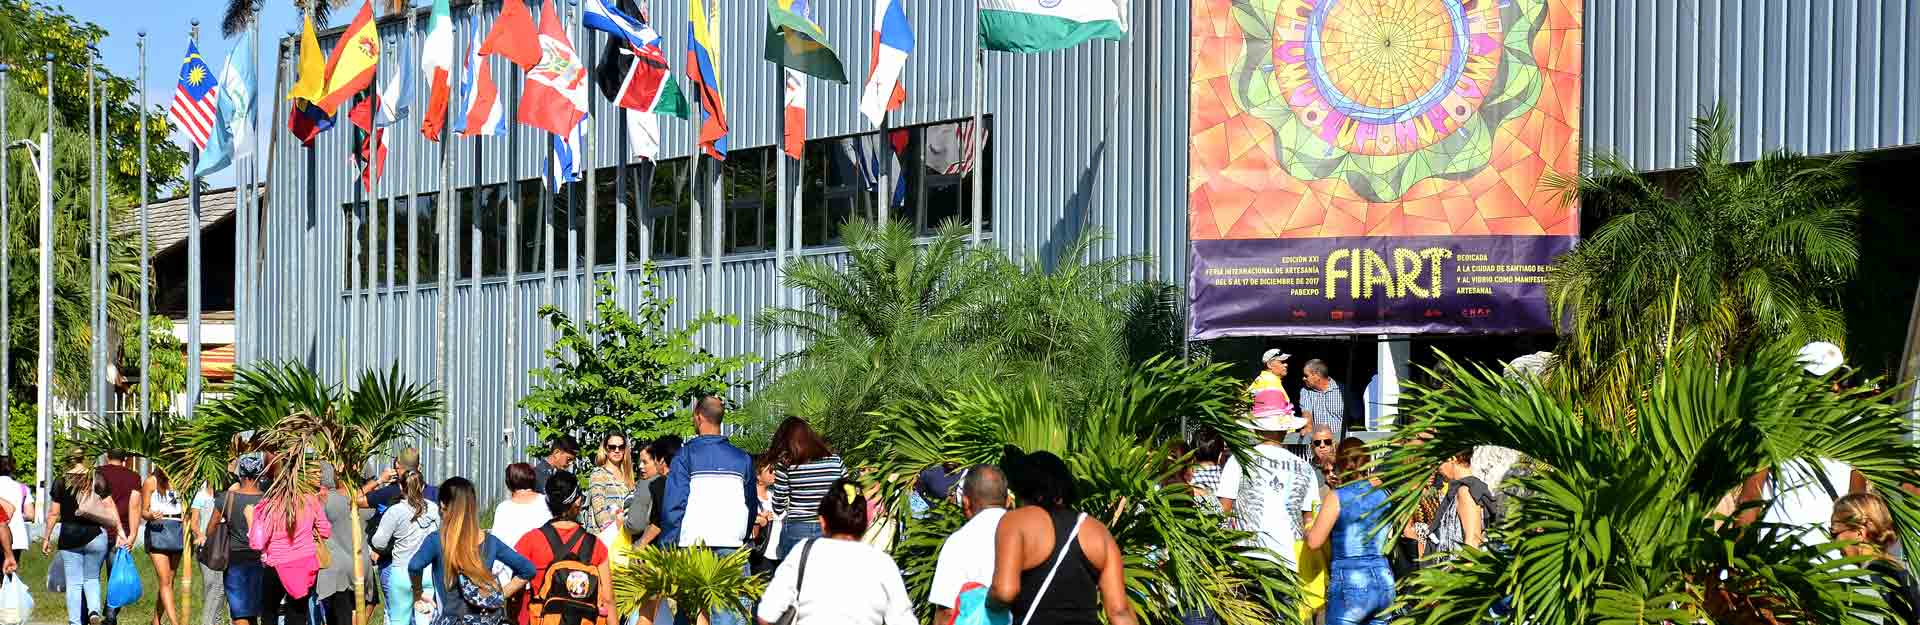 Eventos 2020 en Cuba | Turismo en Cuba | Cuba Travel